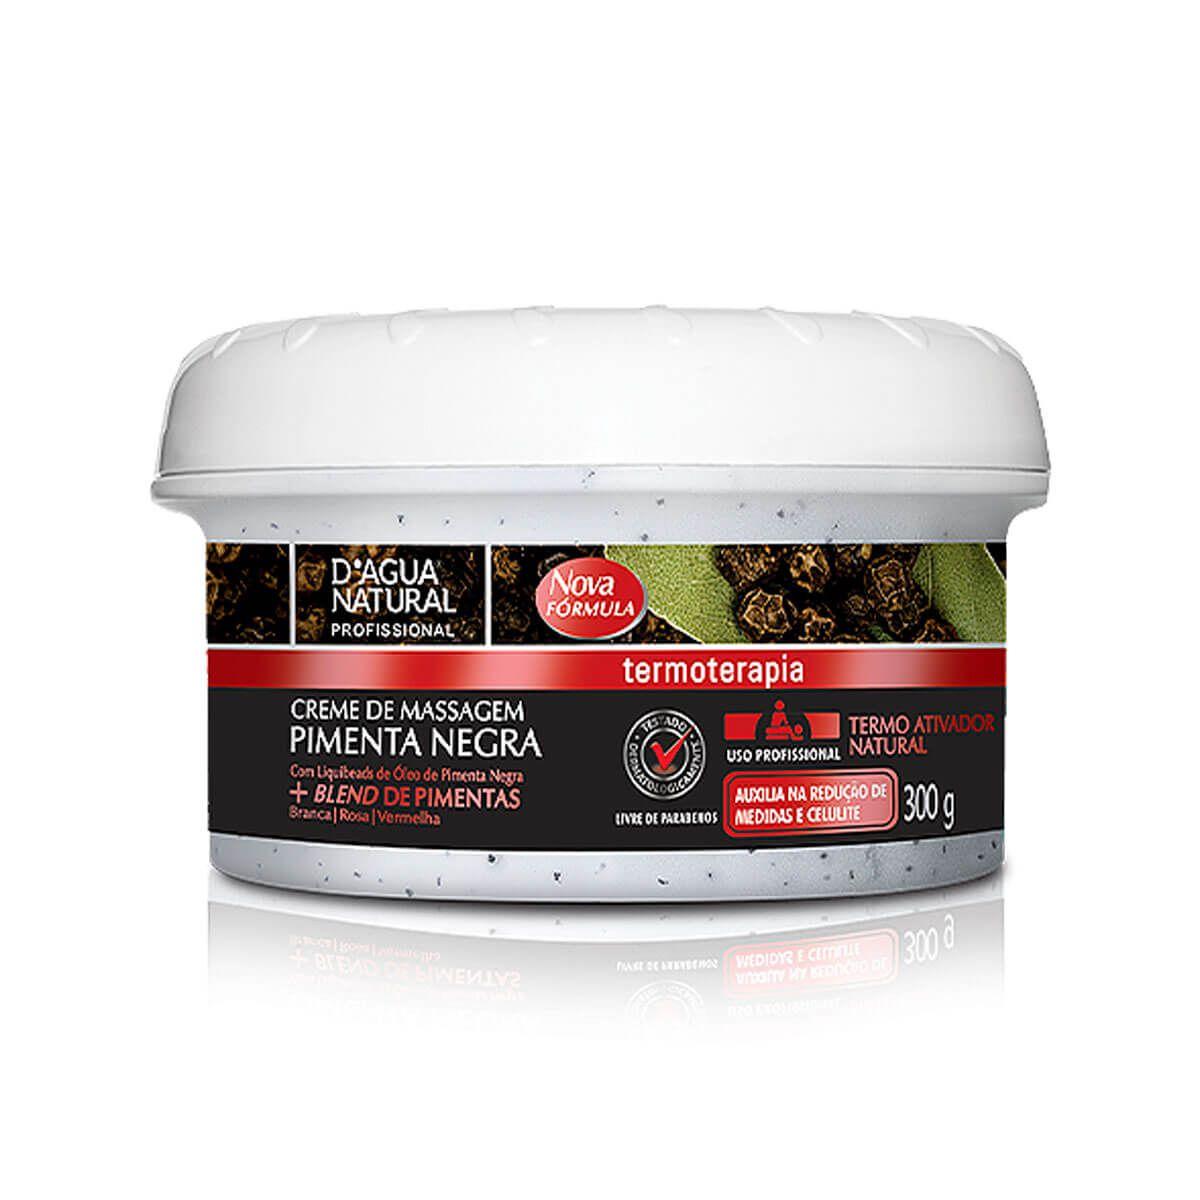 Creme de Massagem D'Água Natural Pimenta Negra 300g